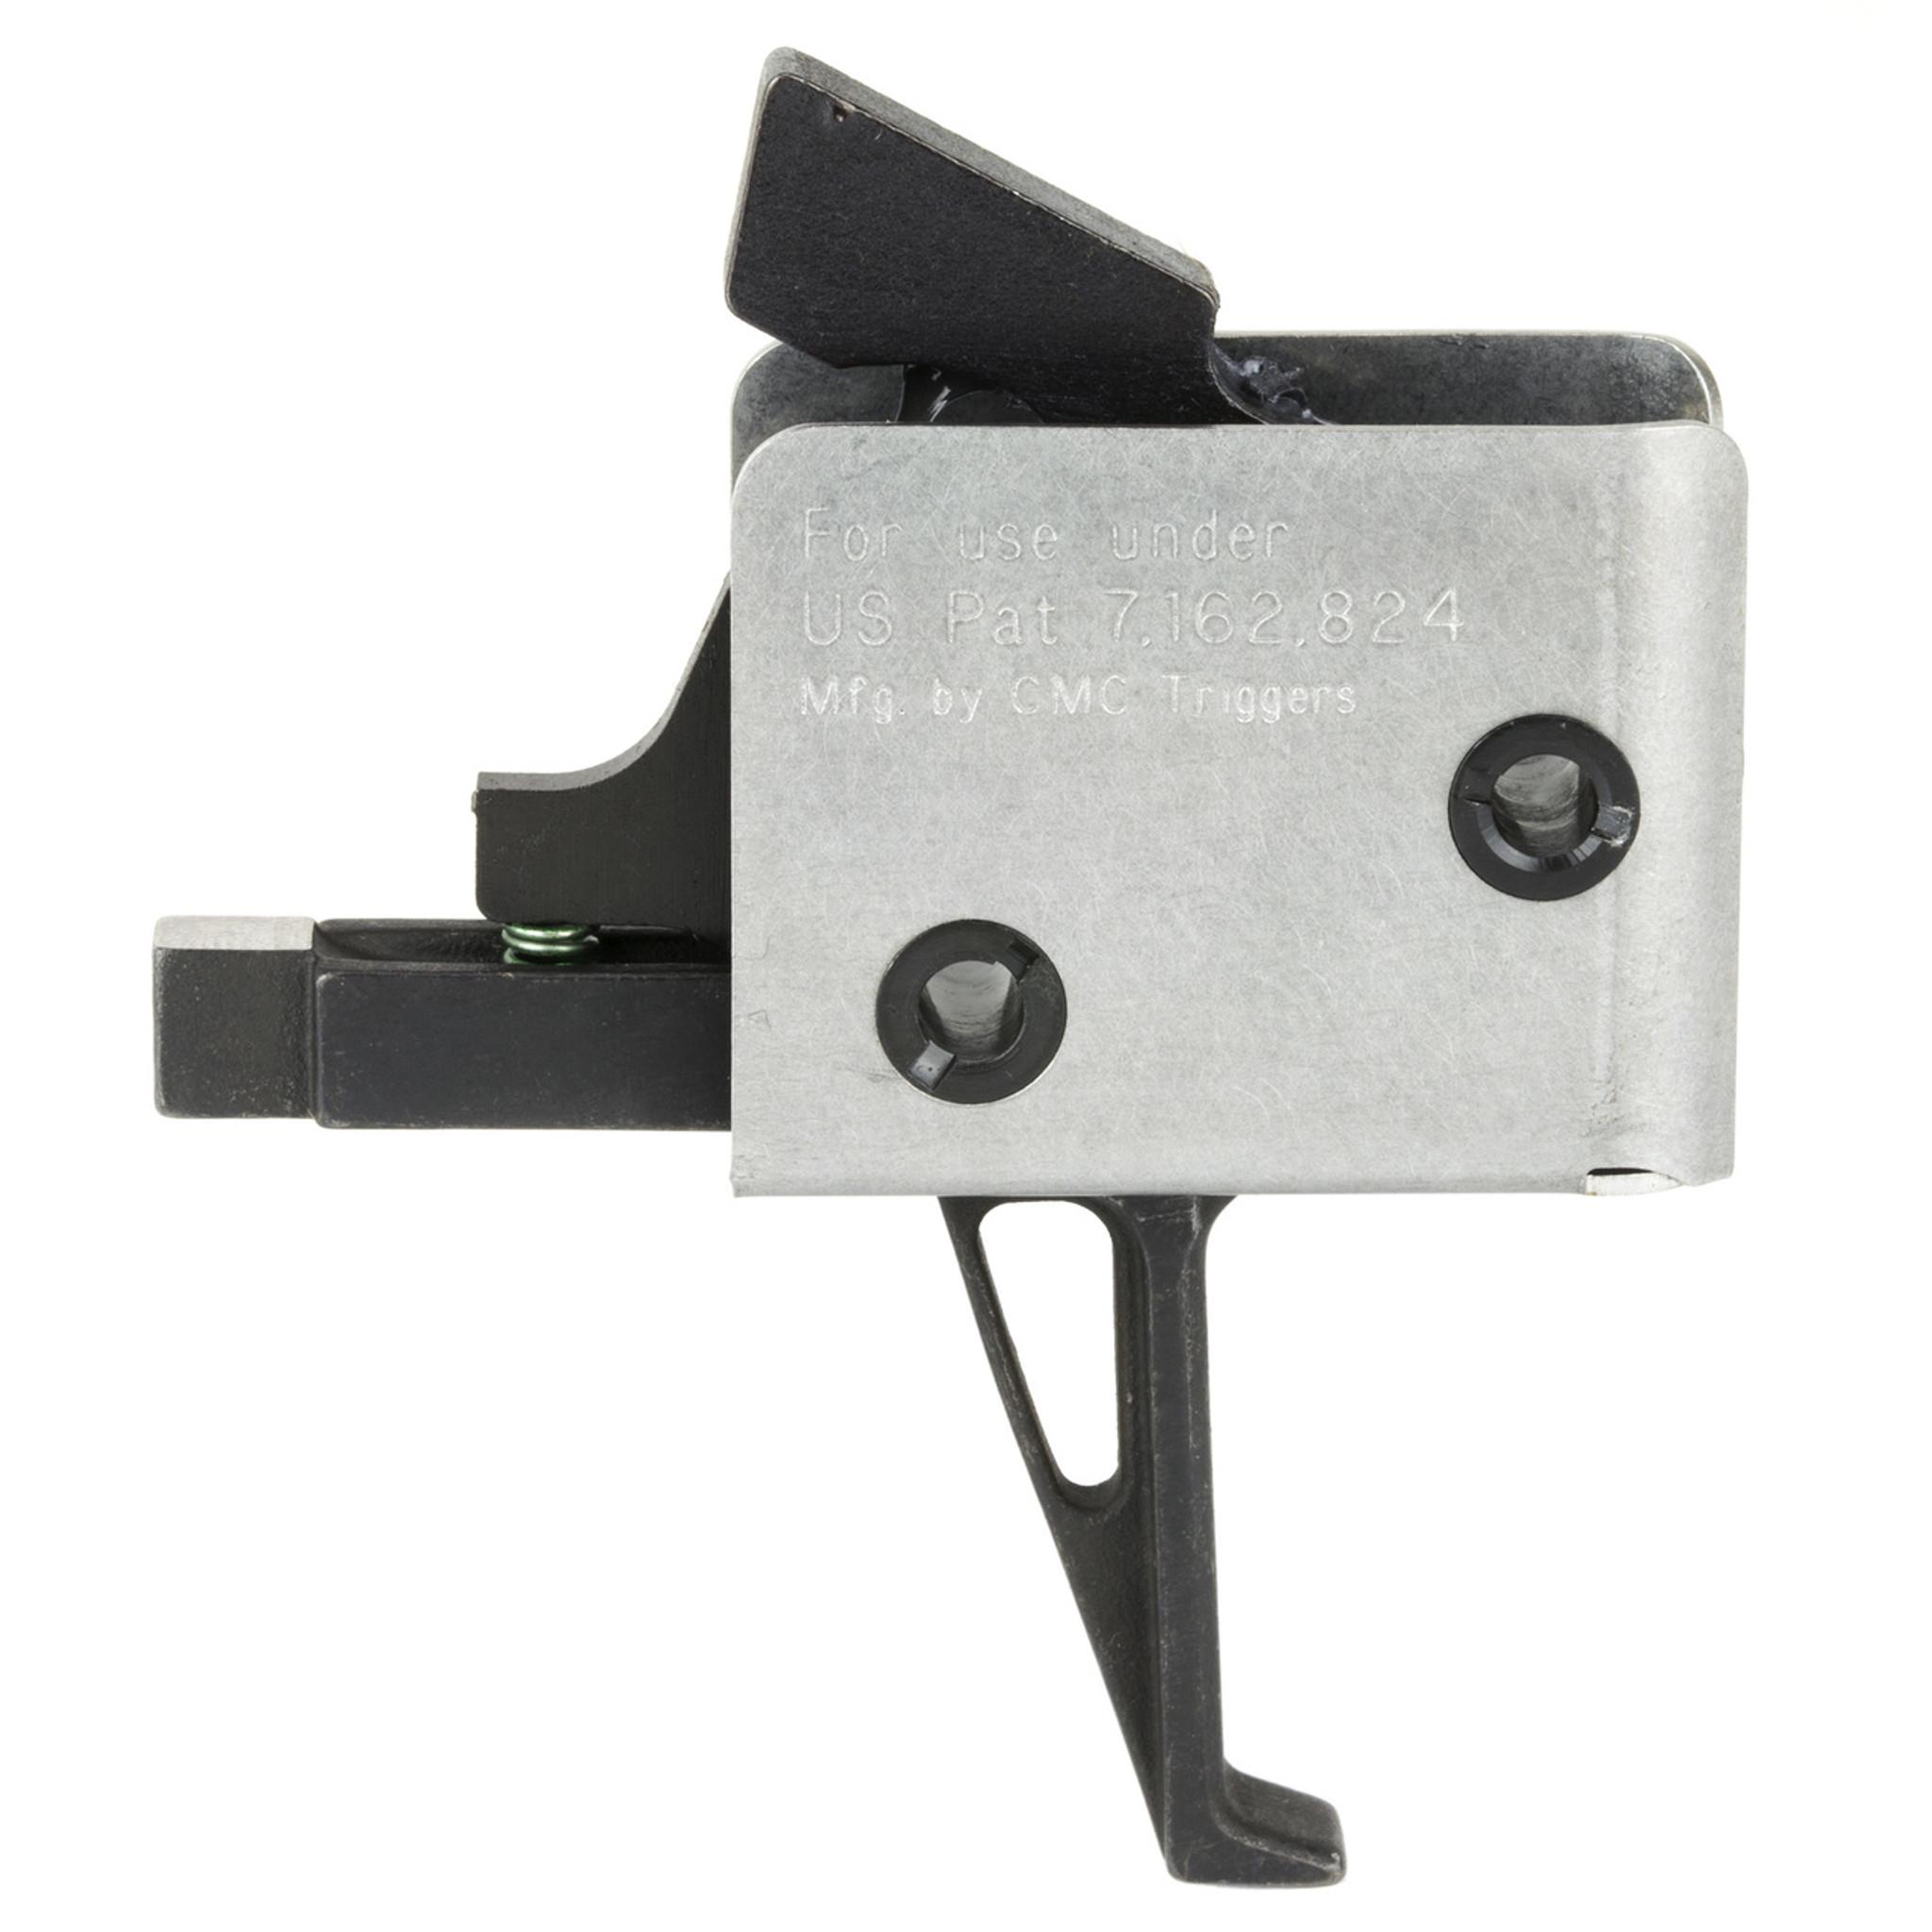 CMC AR-15 / AR-10 9MM PCC Single Stage Drop-In Trigger – Flat Bow - 3 5LB  Pull (95503)